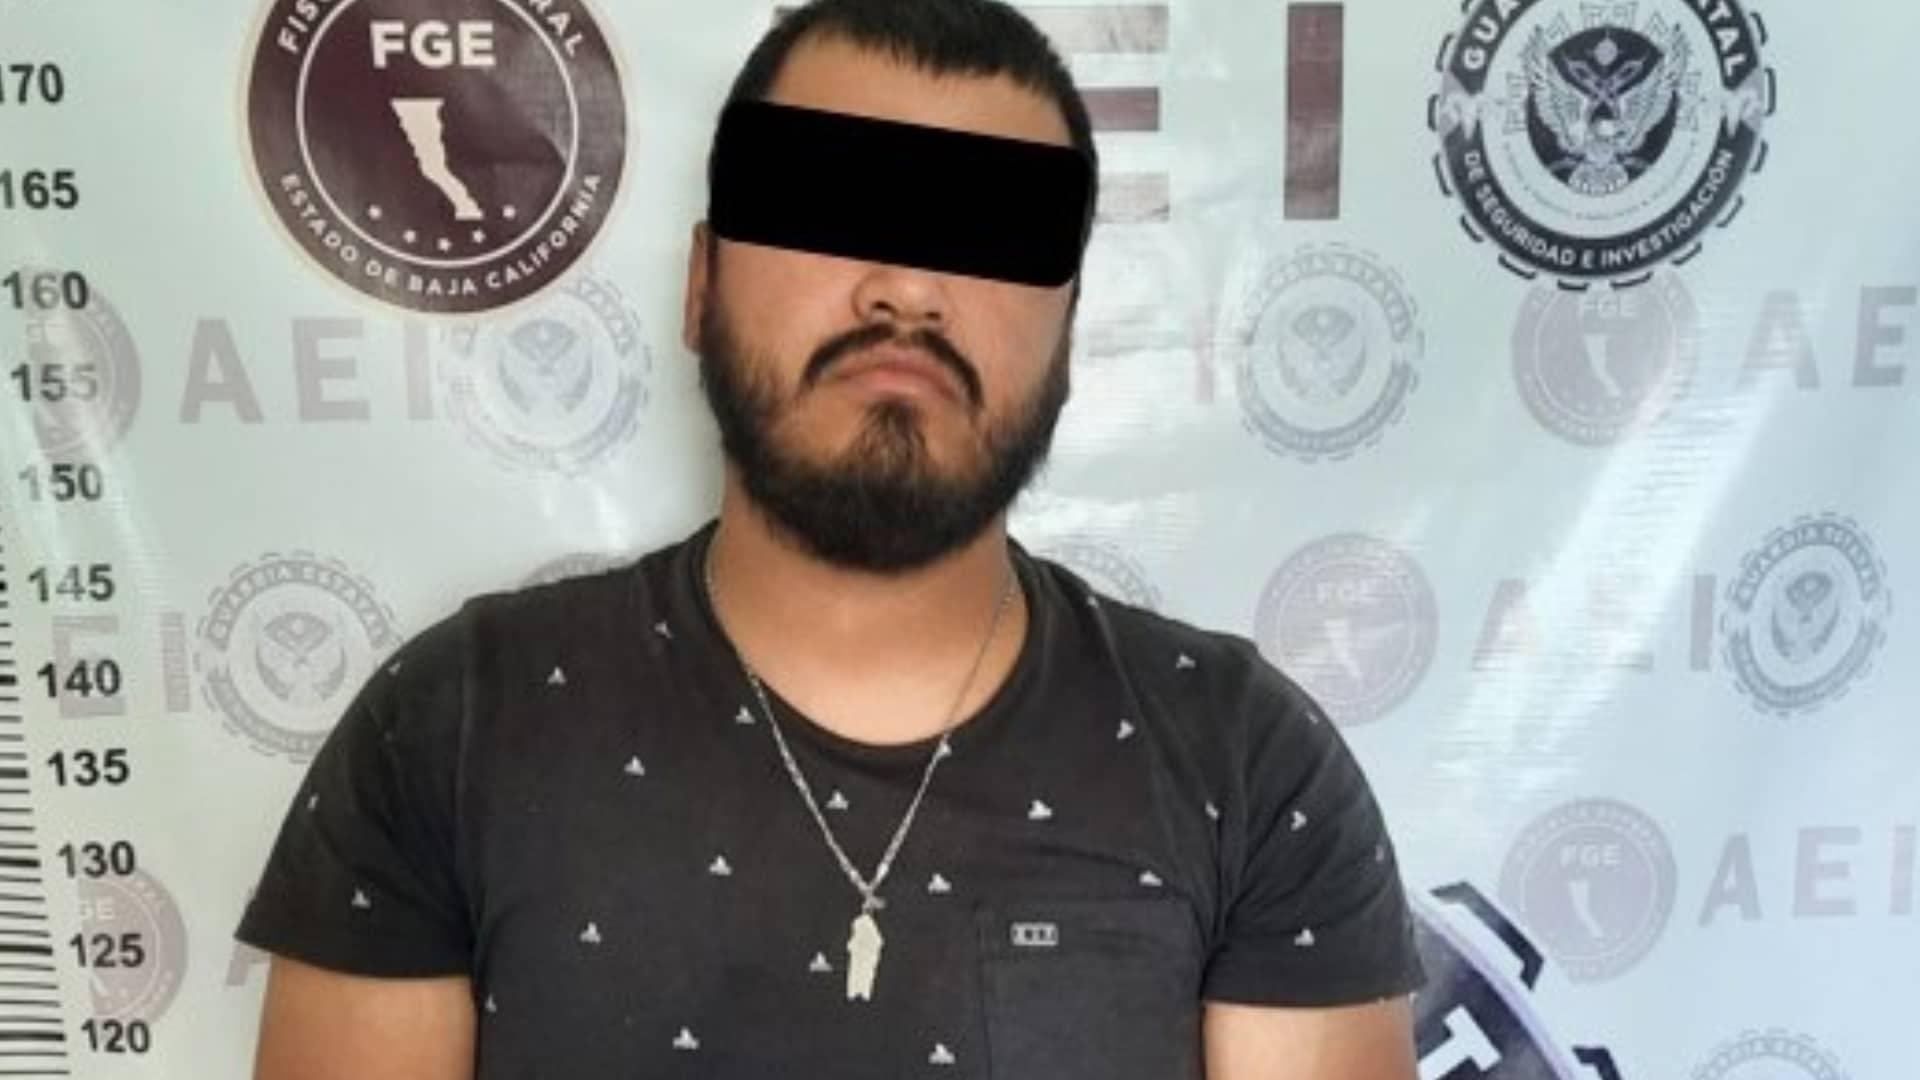 en-prision-presunto-asesino-de-candidato-en-tecate